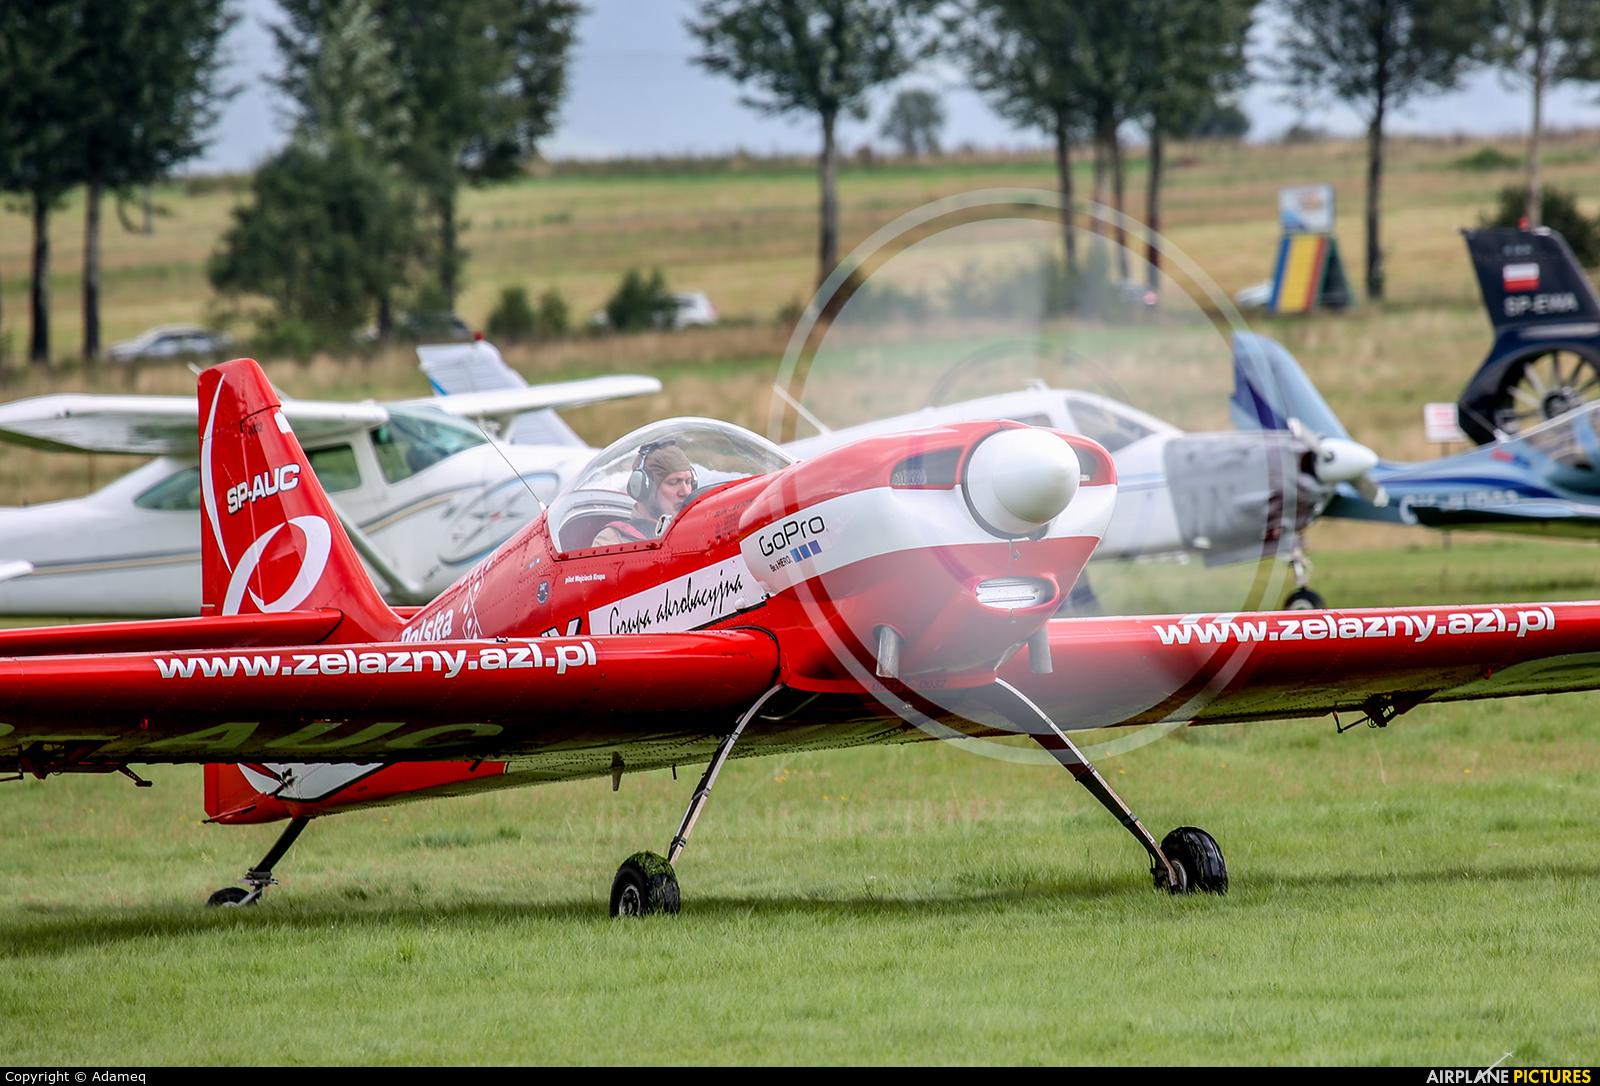 Grupa Akrobacyjna Żelazny - Acrobatic Group SP-AUC aircraft at Nowy Targ